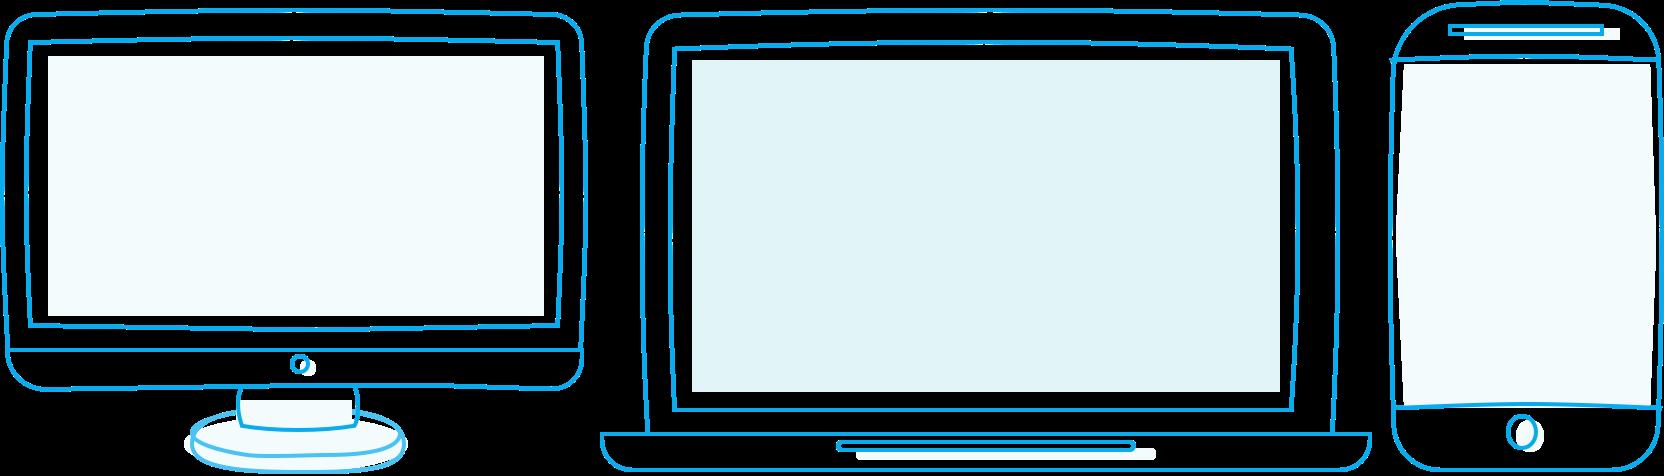 logo-iteration01.png